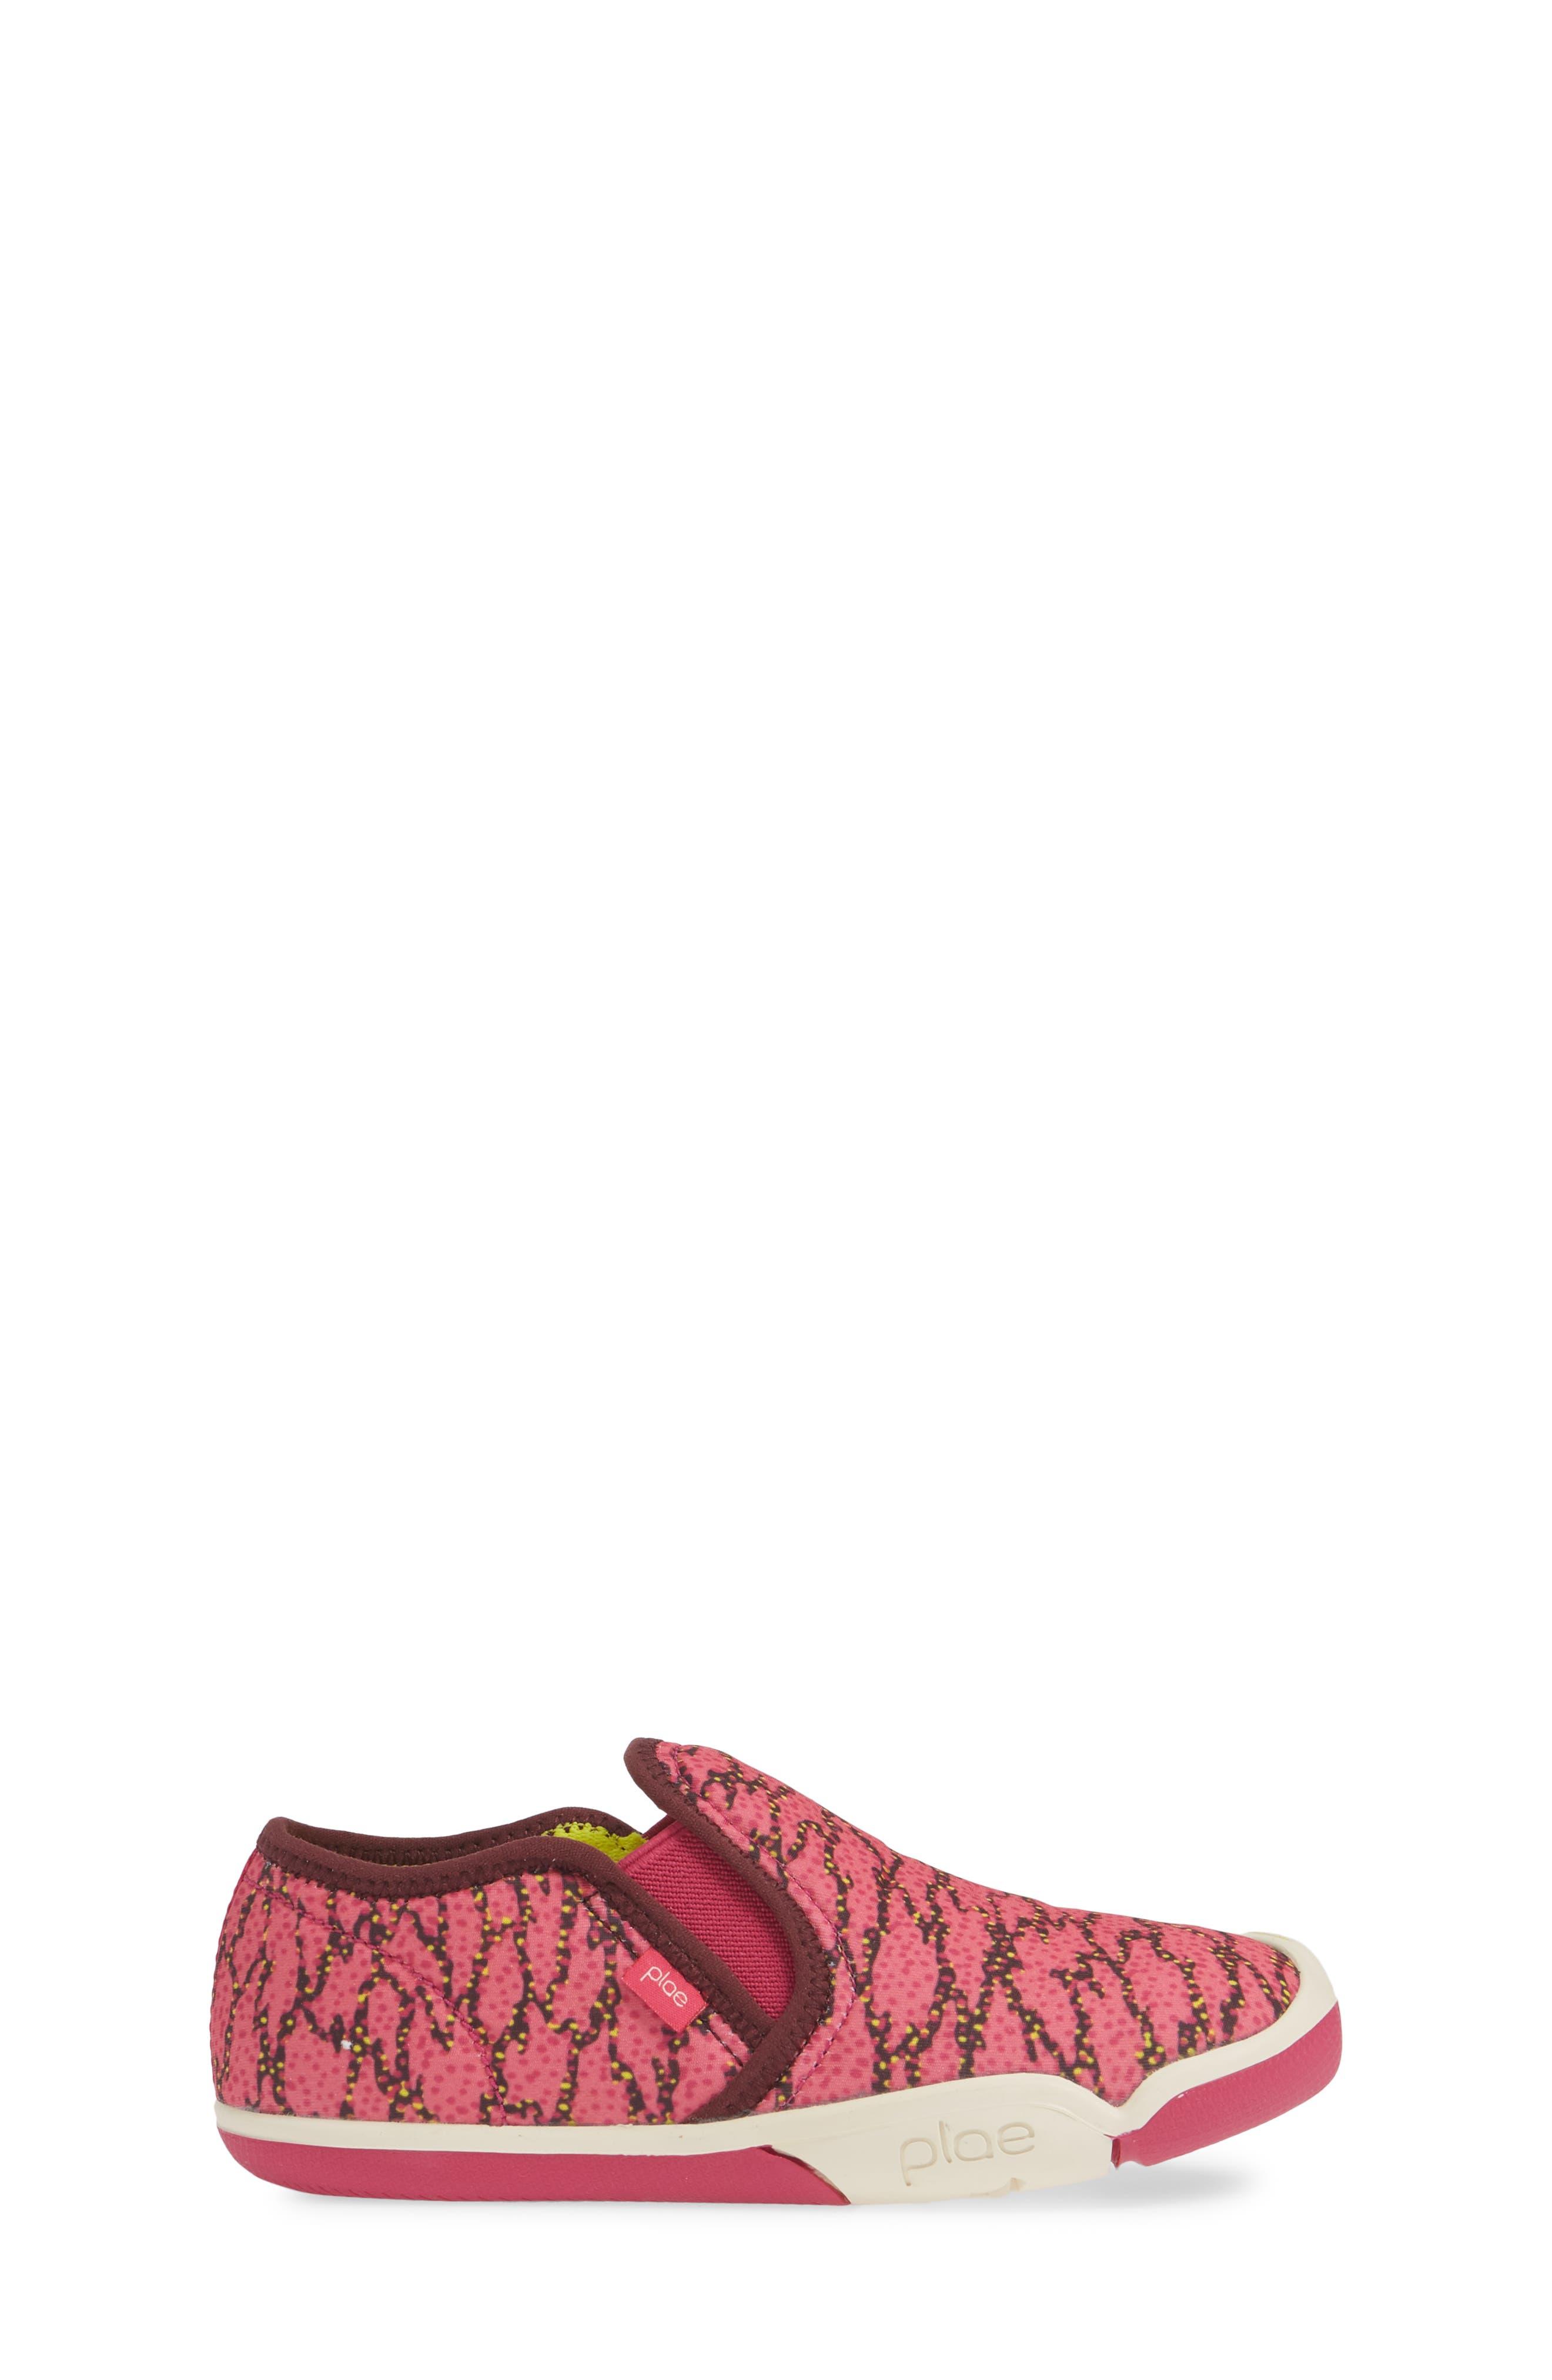 PLAE,                             Migi Slip-On Sneaker,                             Alternate thumbnail 3, color,                             ELECTRIC FUCHSIA SURGE